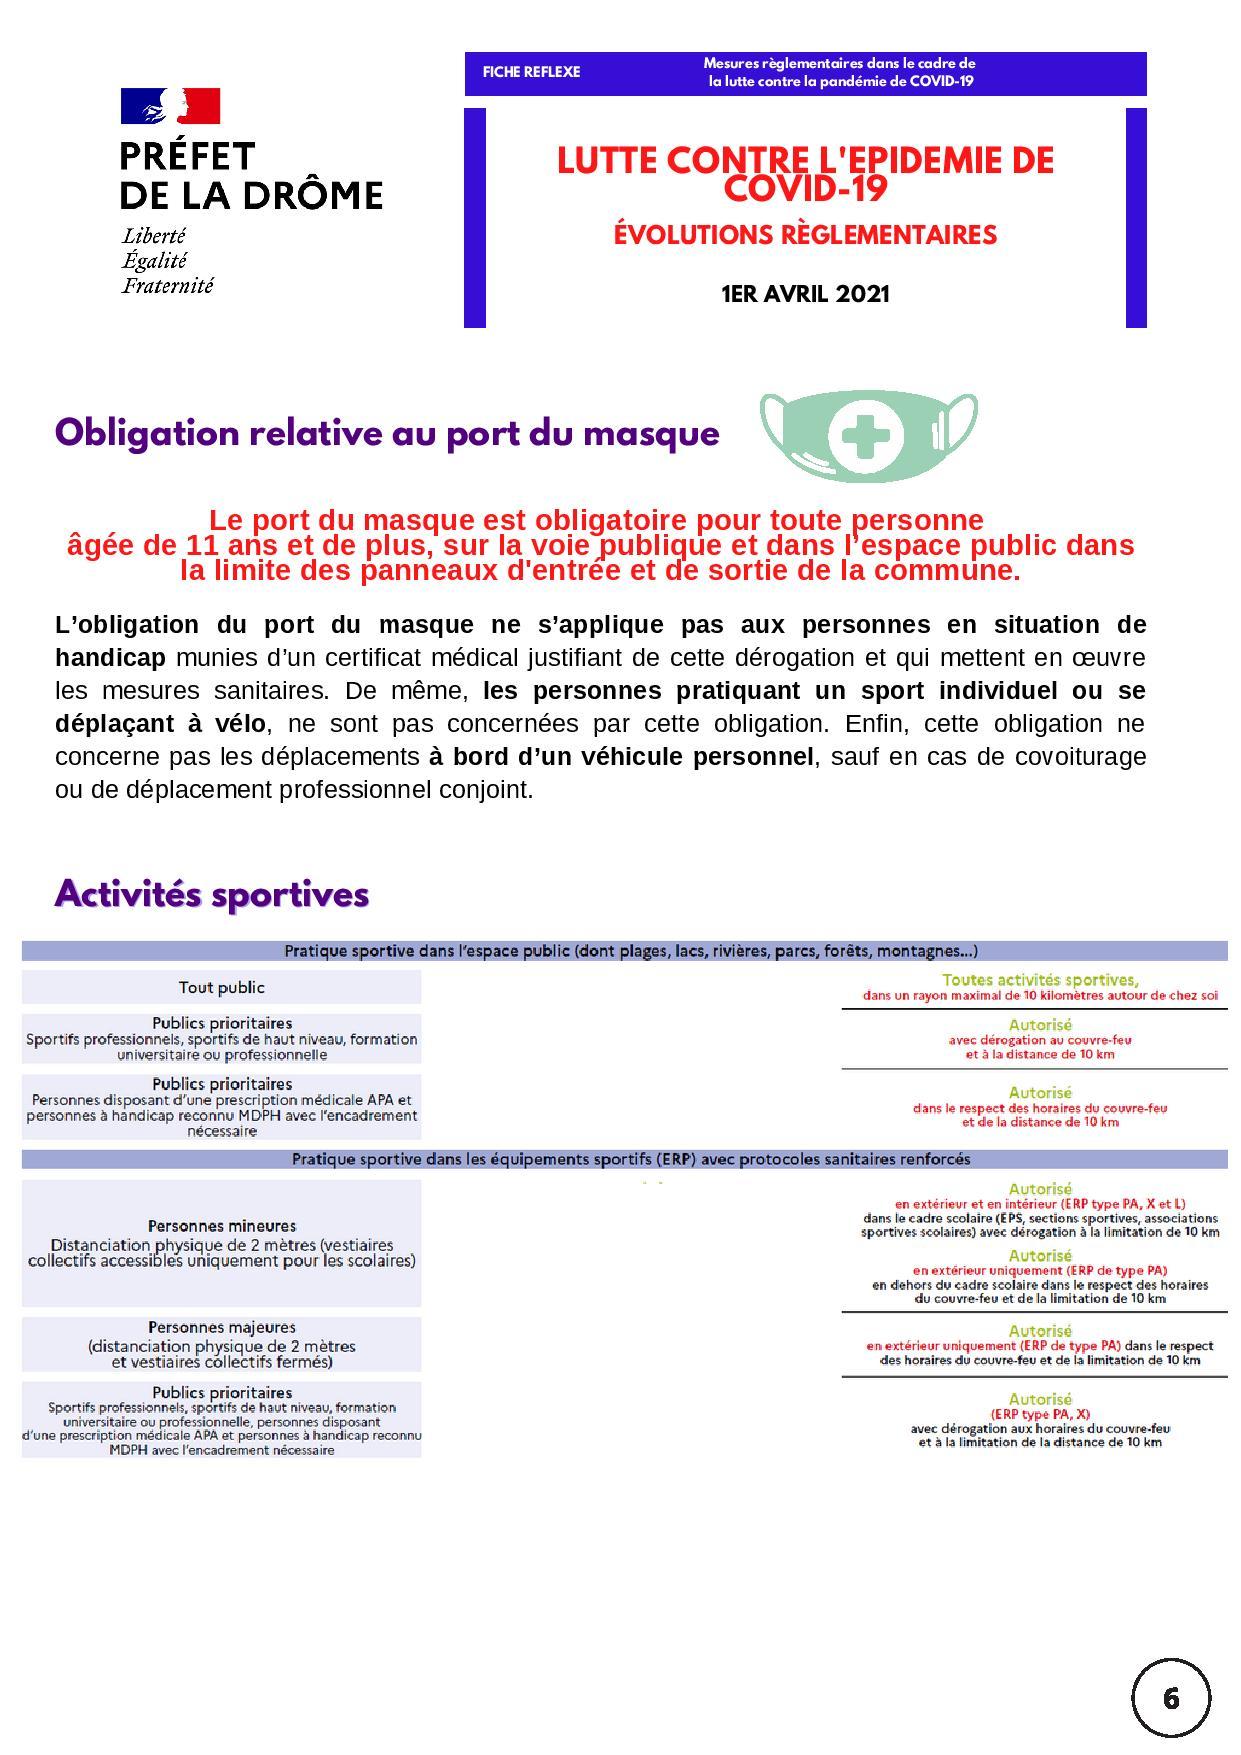 Fiche réflexe du 1er avril 2021-1-page-006.jpg